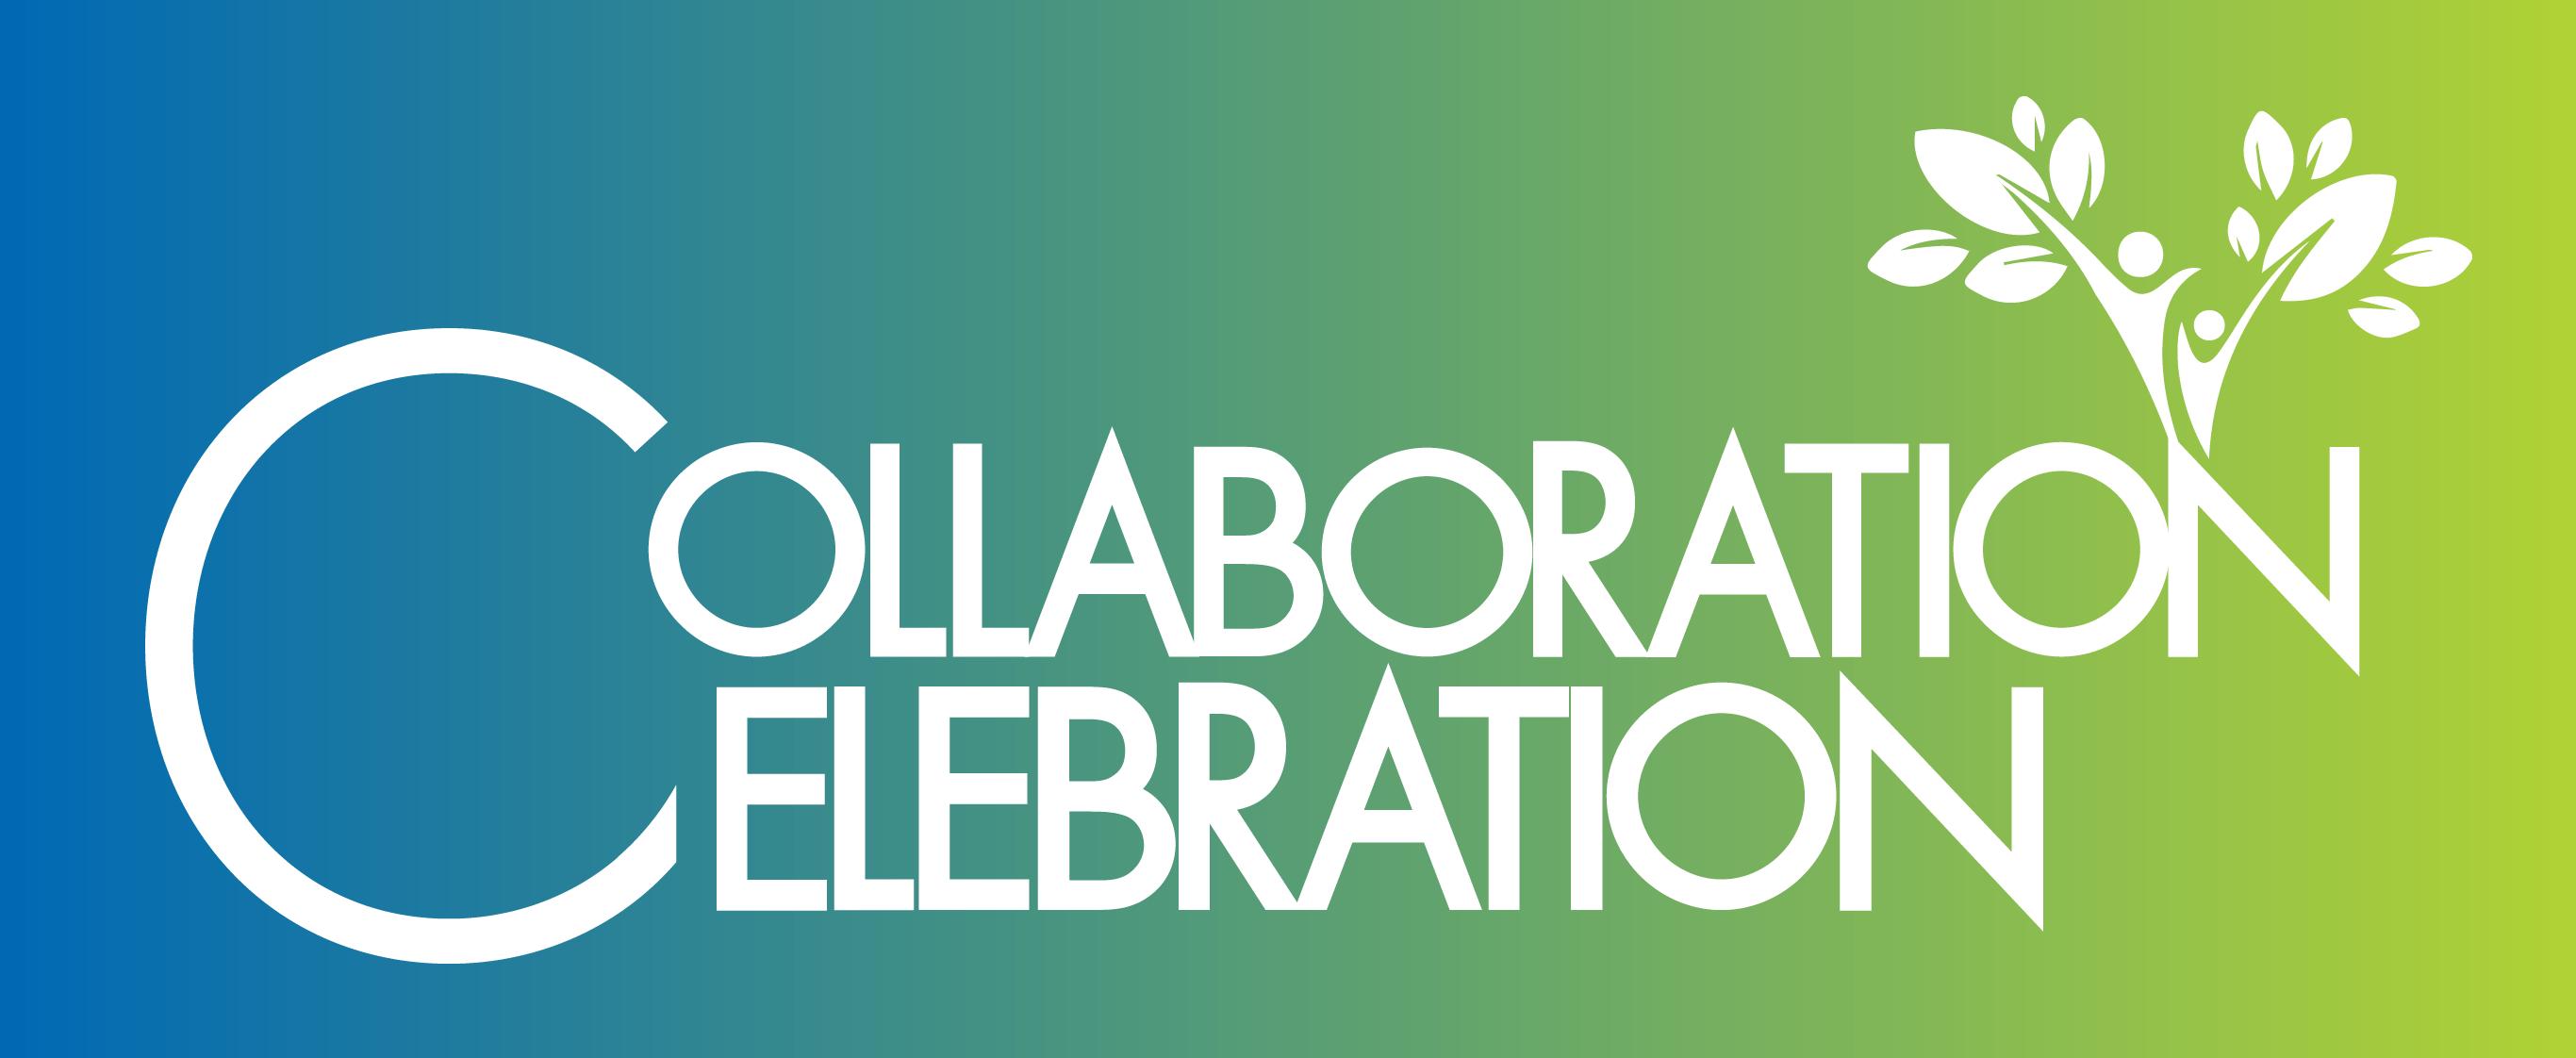 Collaboration Celebration 2022 Featured Image